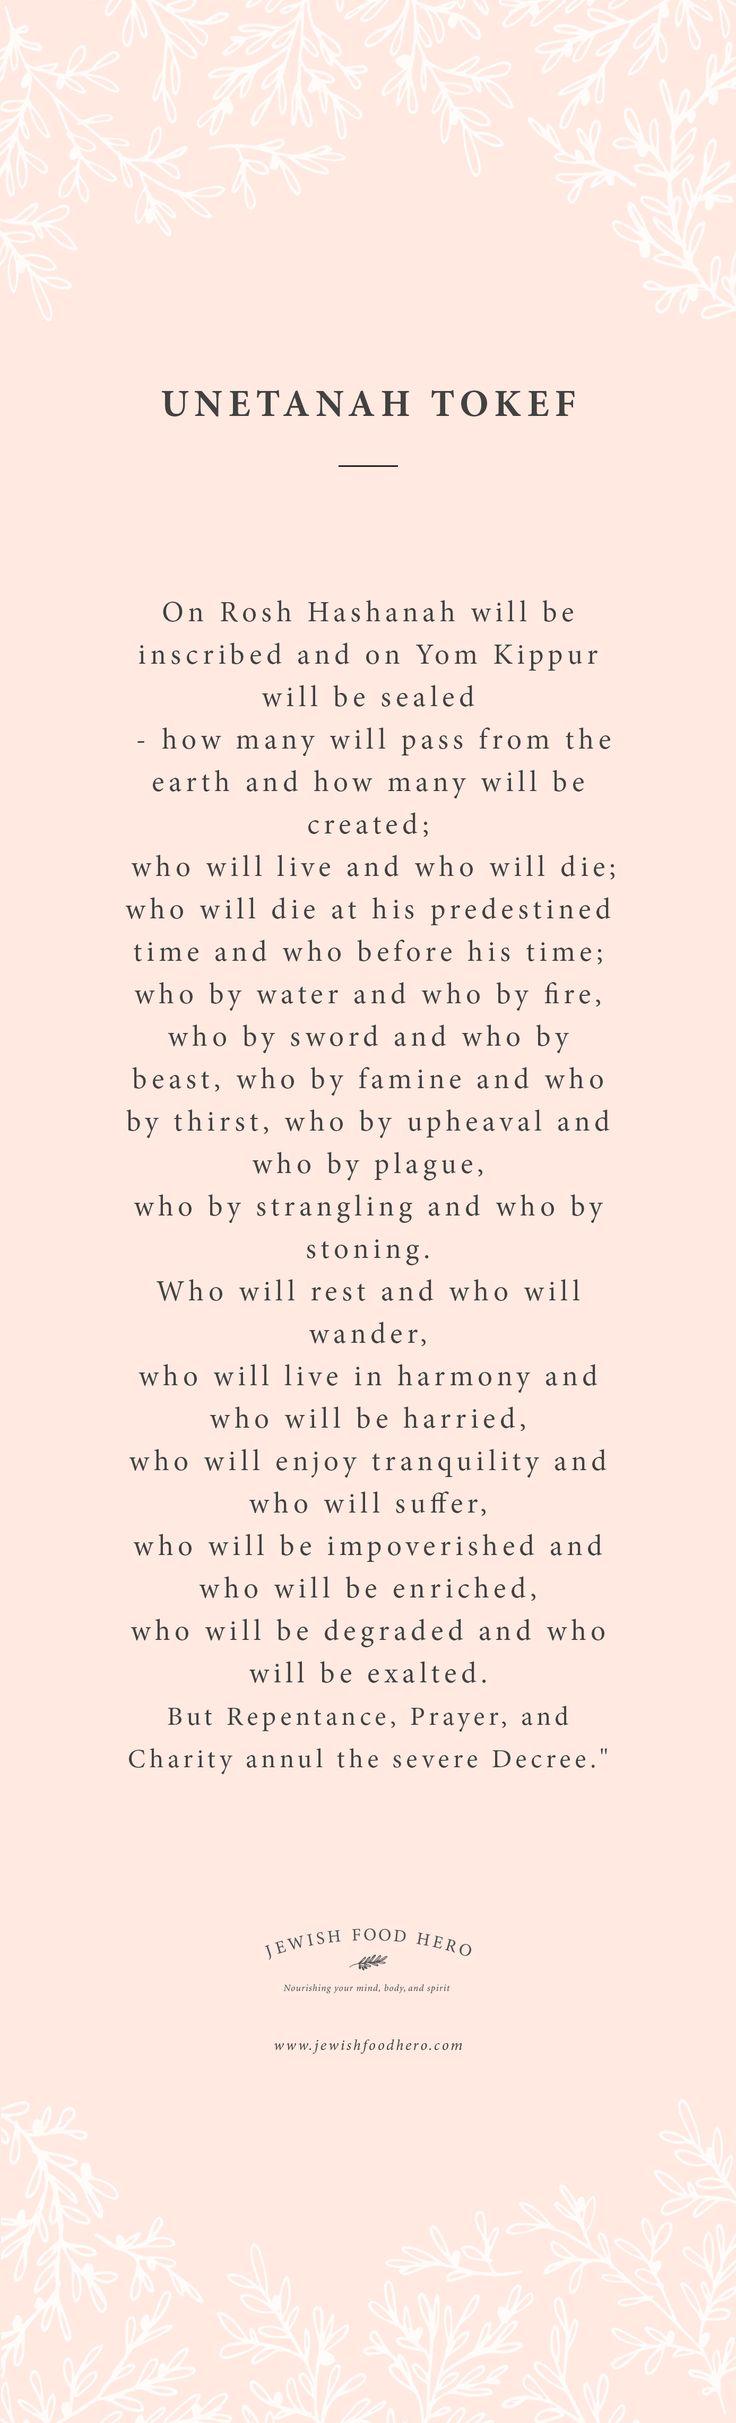 rosh hashanah quotes in night